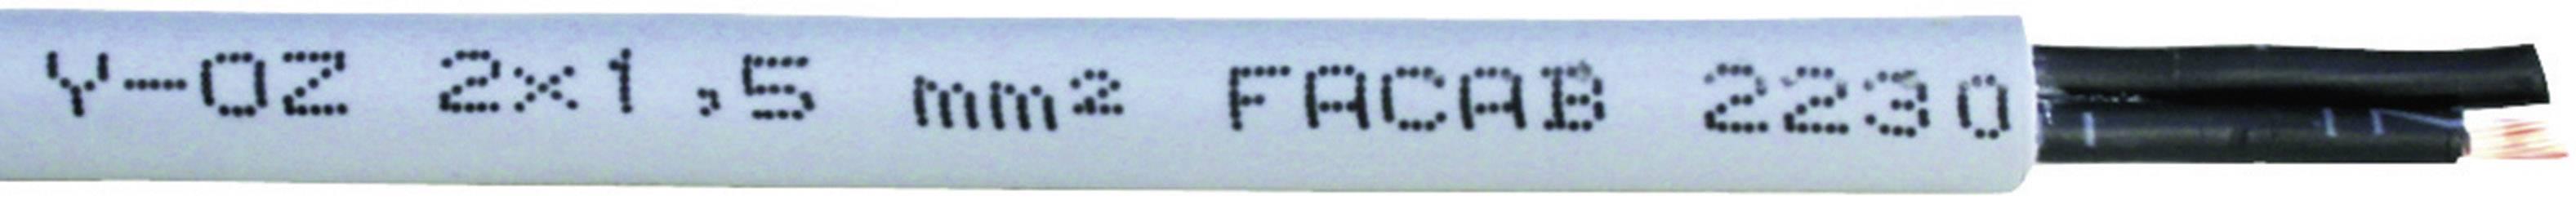 Riadiaci kábel Faber Kabel YSLY-OZ 030628, 4 x 1.50 mm², vonkajší Ø 7.30 mm, 500 V, metrový tovar, sivá